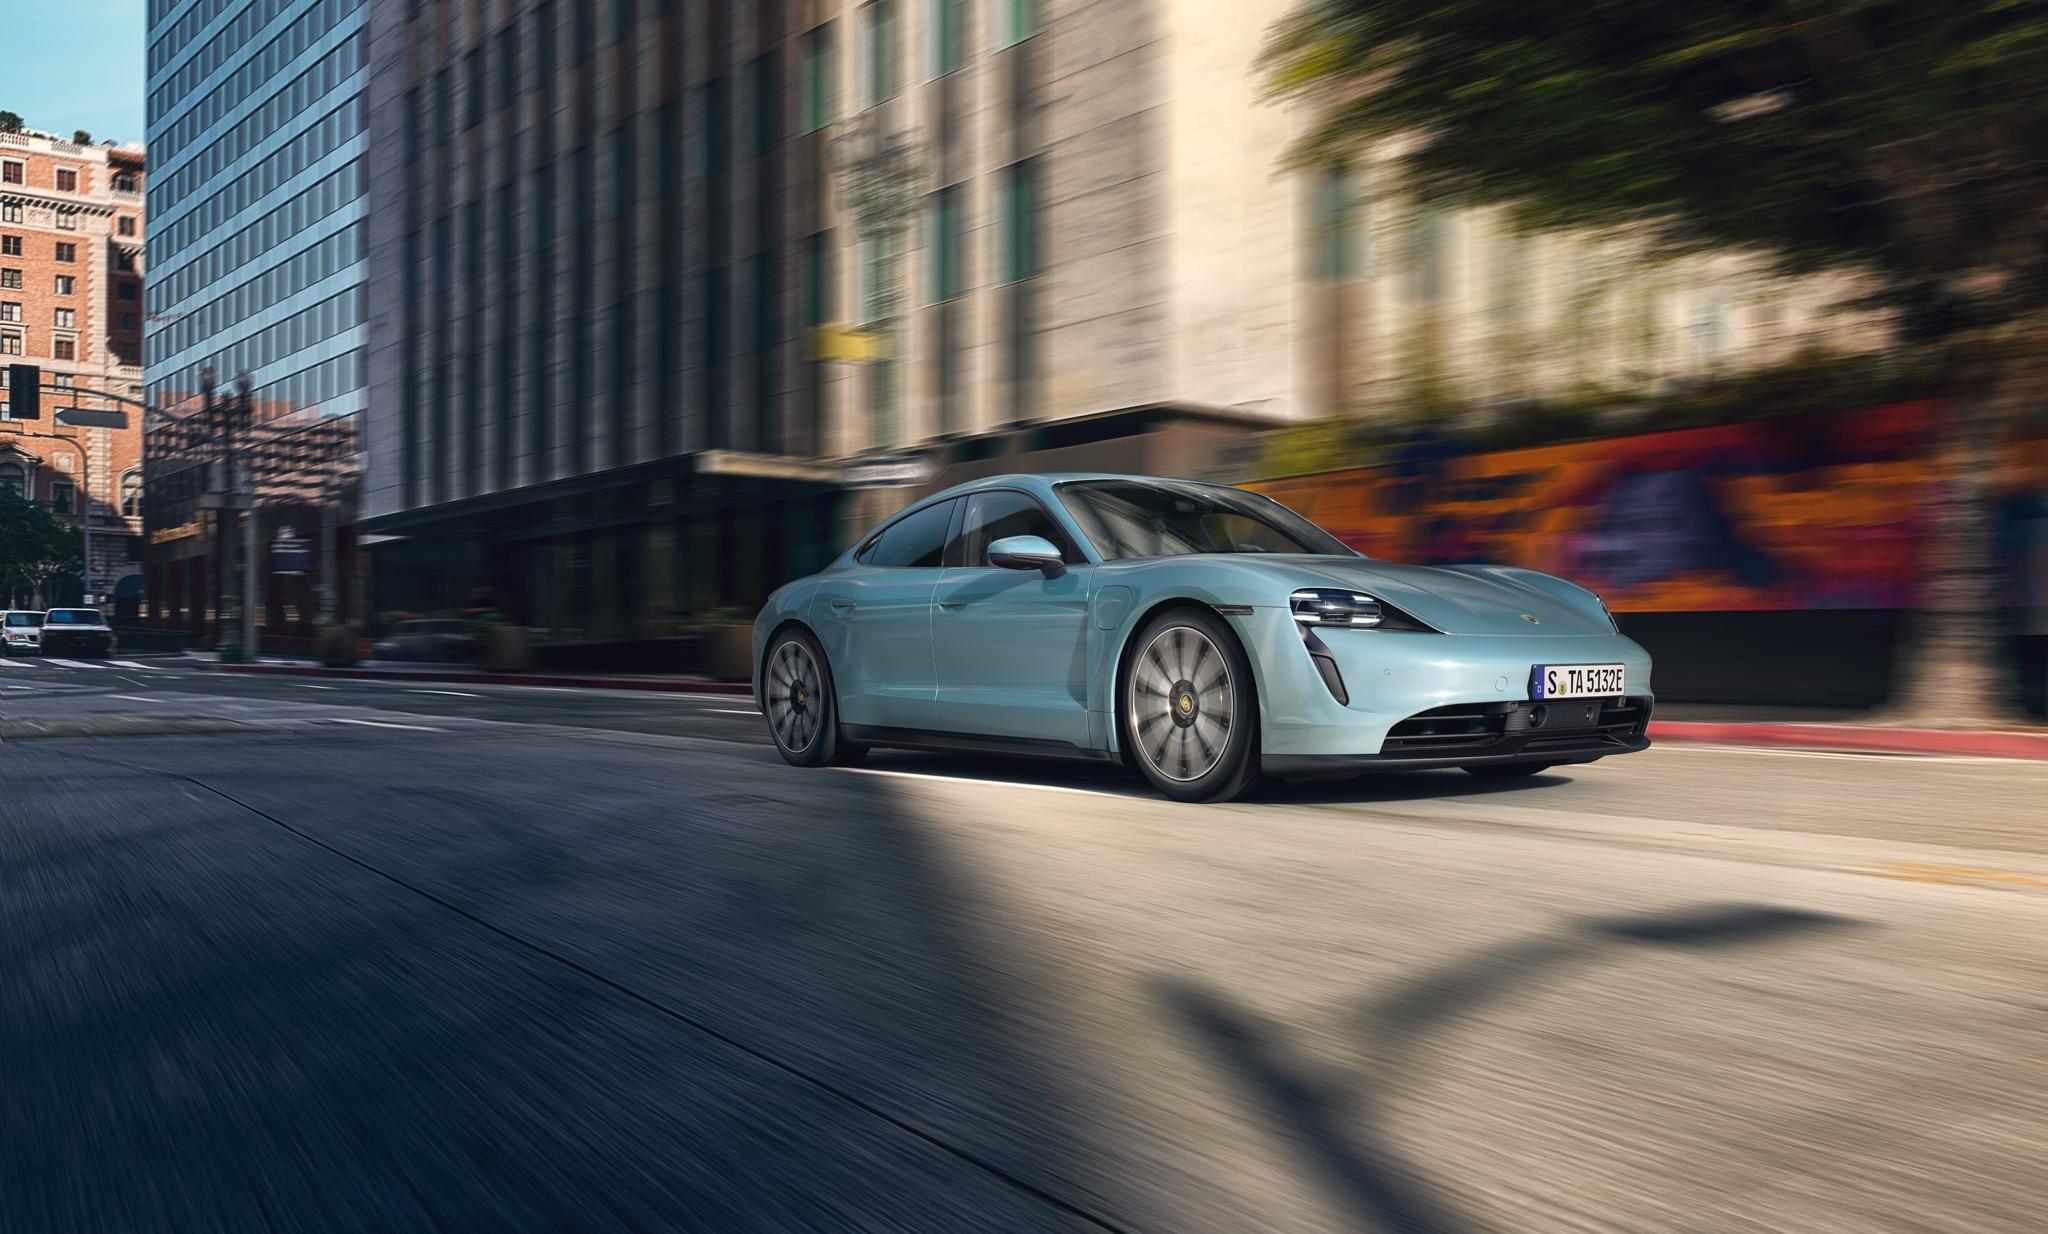 TEST DRIVE: Porsche Taycan 4S, Supercar Listrik Dengan Feeling Natural (Bagian 1)